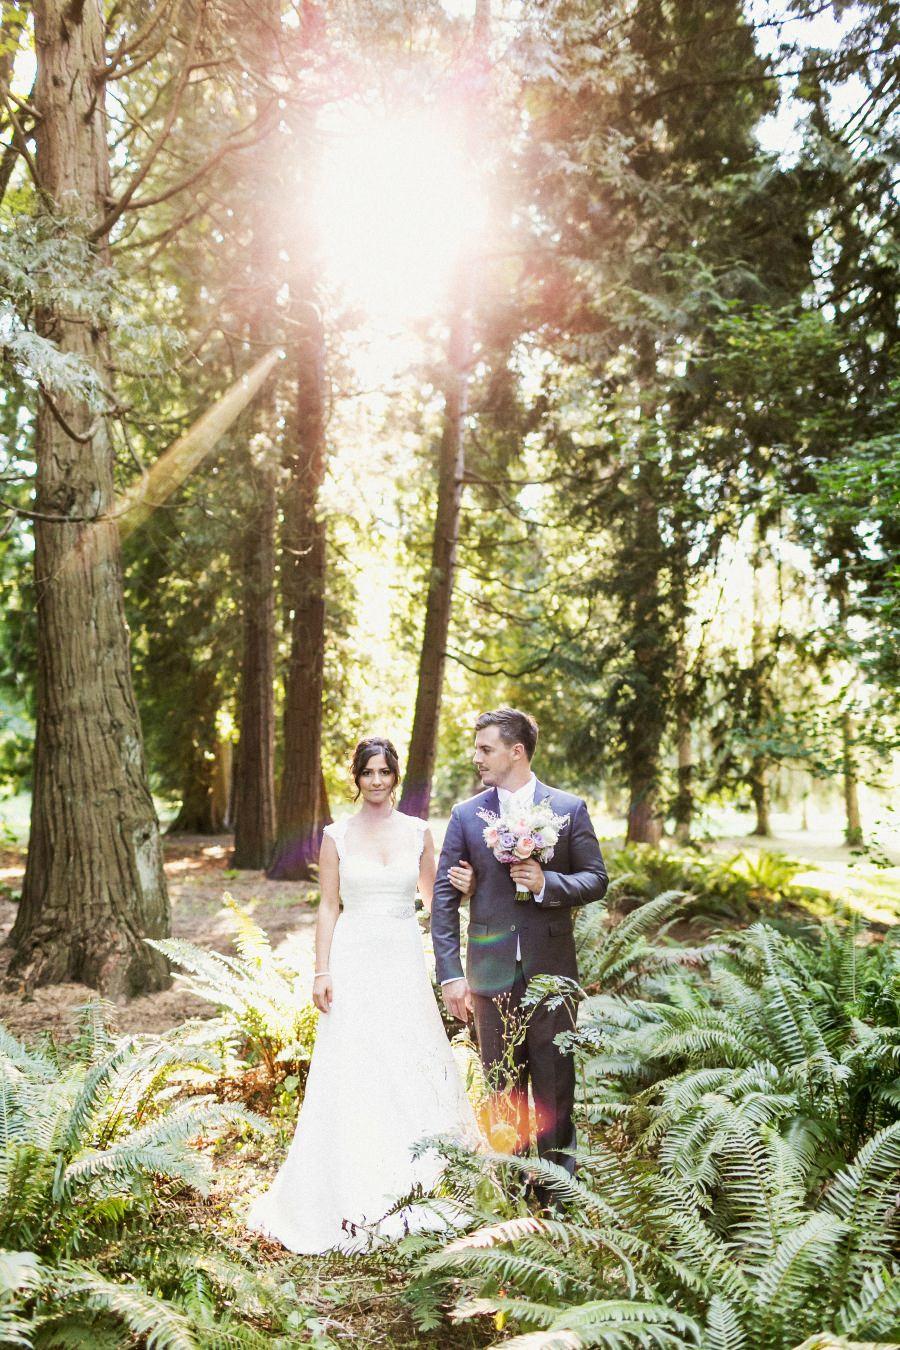 Creative Wedding Photographer Vancouver Tie The Knot Tour